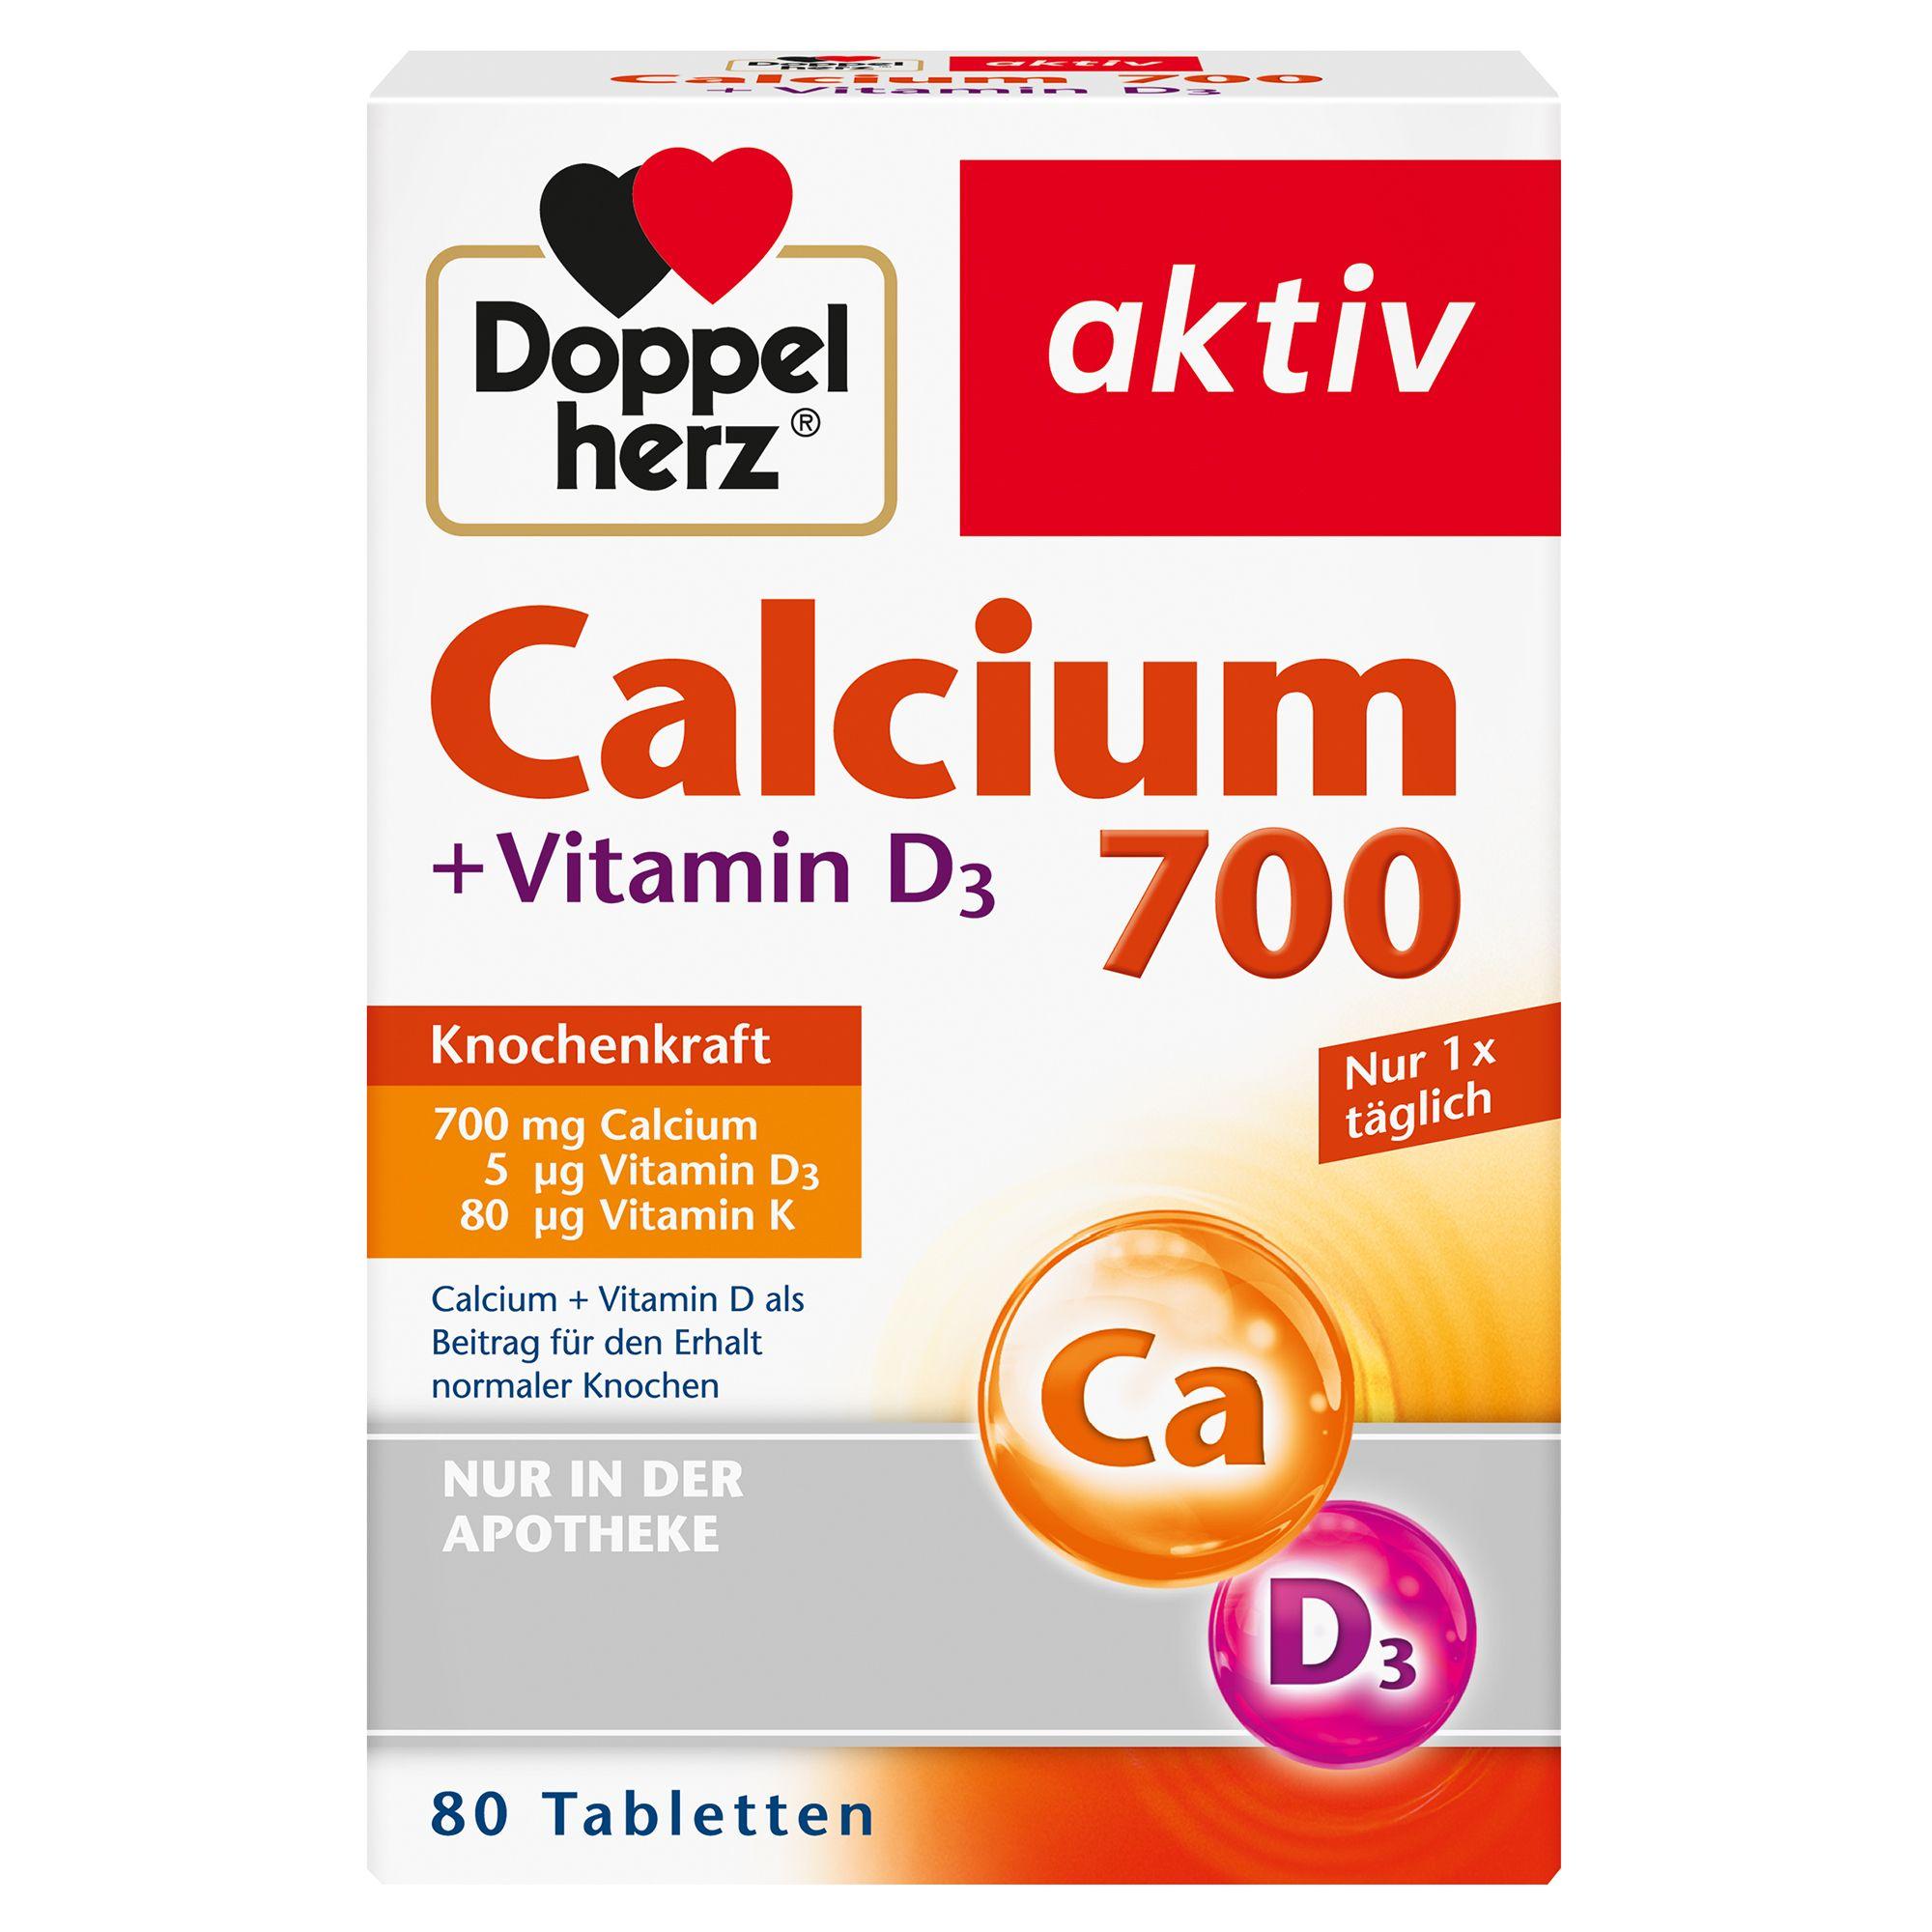 Image of Doppelherz Calcium 700 + D3